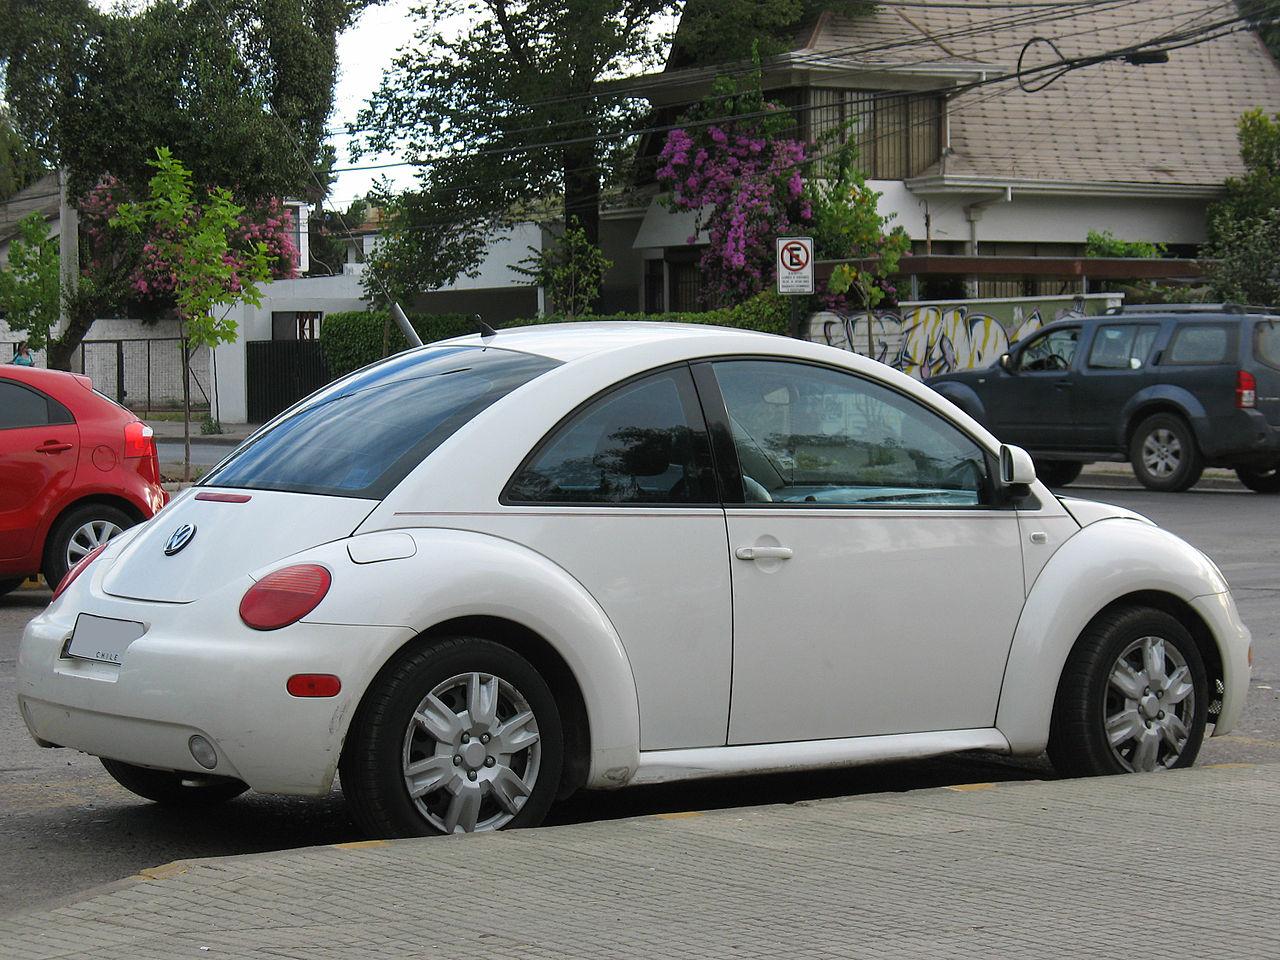 file volkswagen new beetle 2 0 2000 16501910677 jpg wikimedia commons. Black Bedroom Furniture Sets. Home Design Ideas